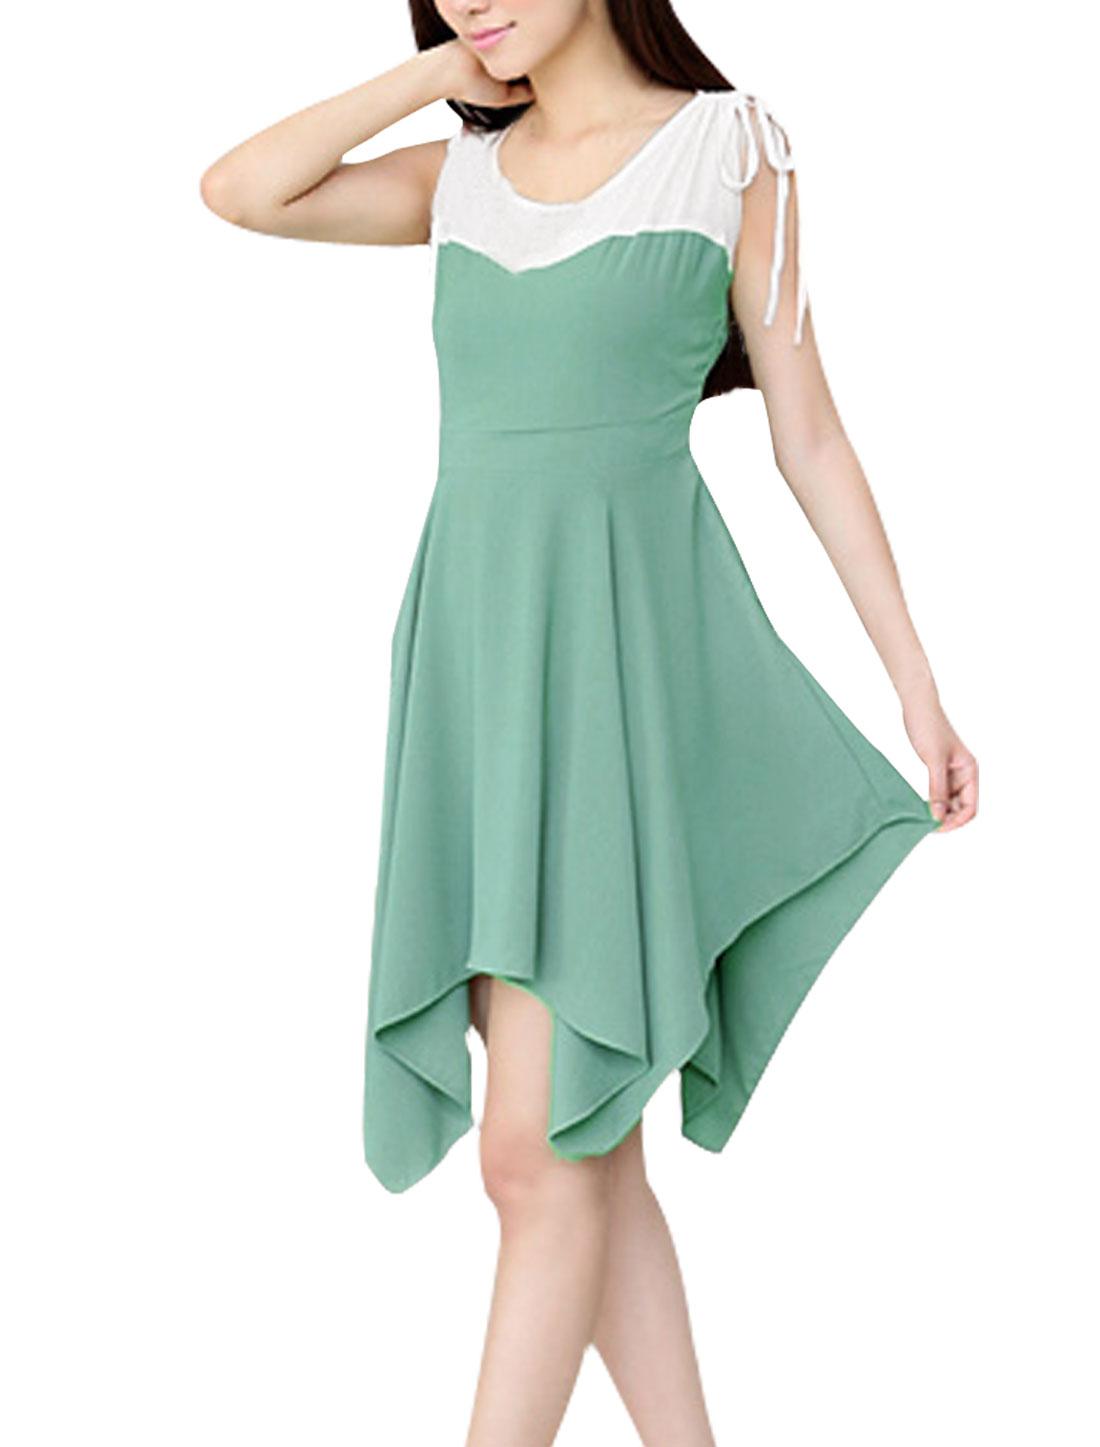 Ladies Light Green Drawstring Gathered Detail Sleeveless Chiffon Dress XS